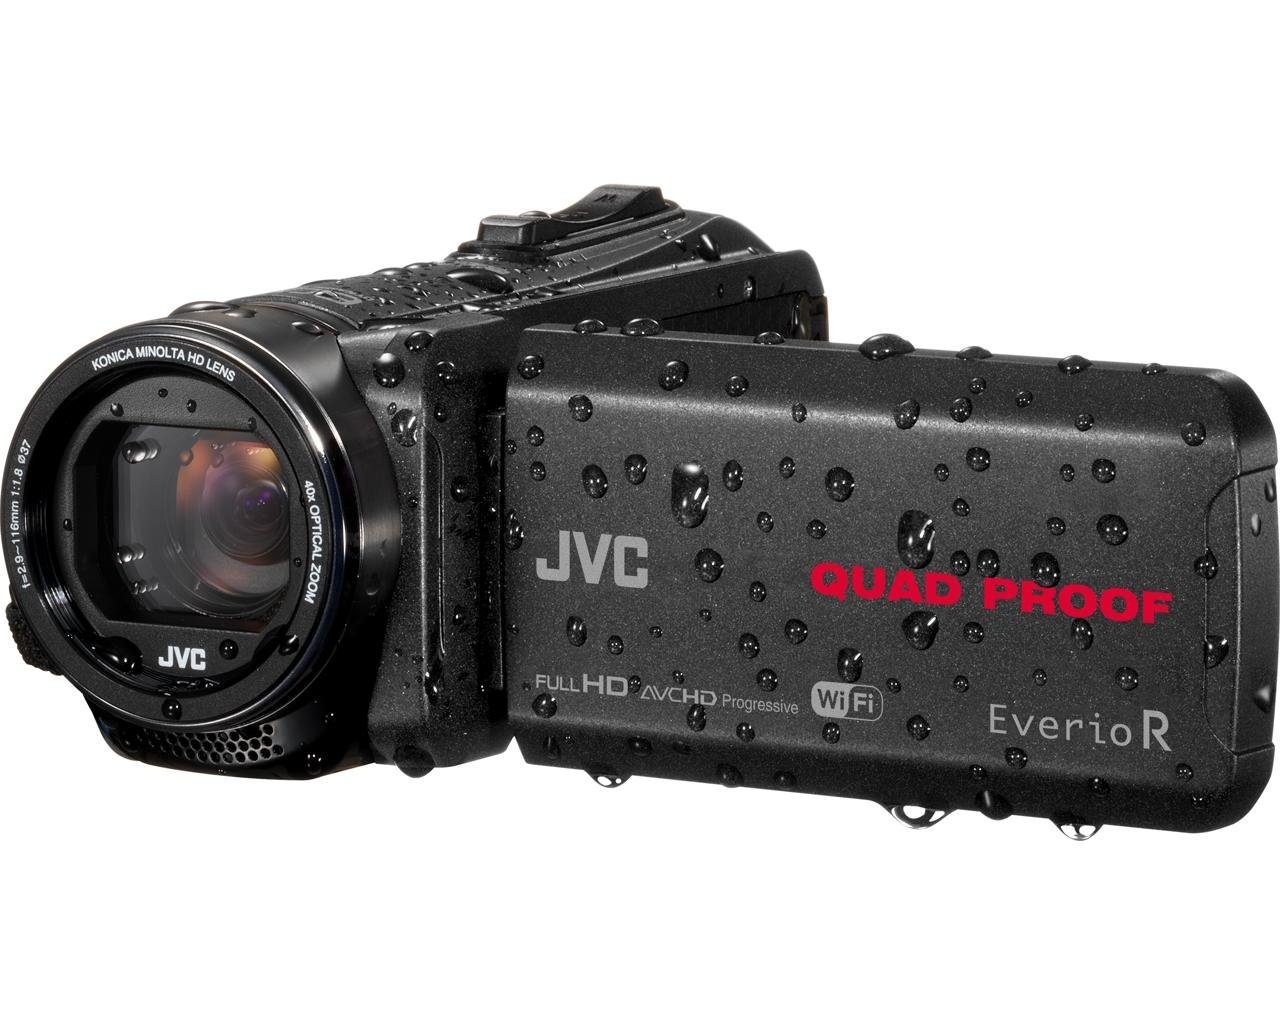 "JVC GZ-RX640BEU - Videocámara (2,5 MP, CMOS, 25,4 / 5,8 mm (1 / 5.8""), 40x, 100x, 2,9 - 116 mm)"